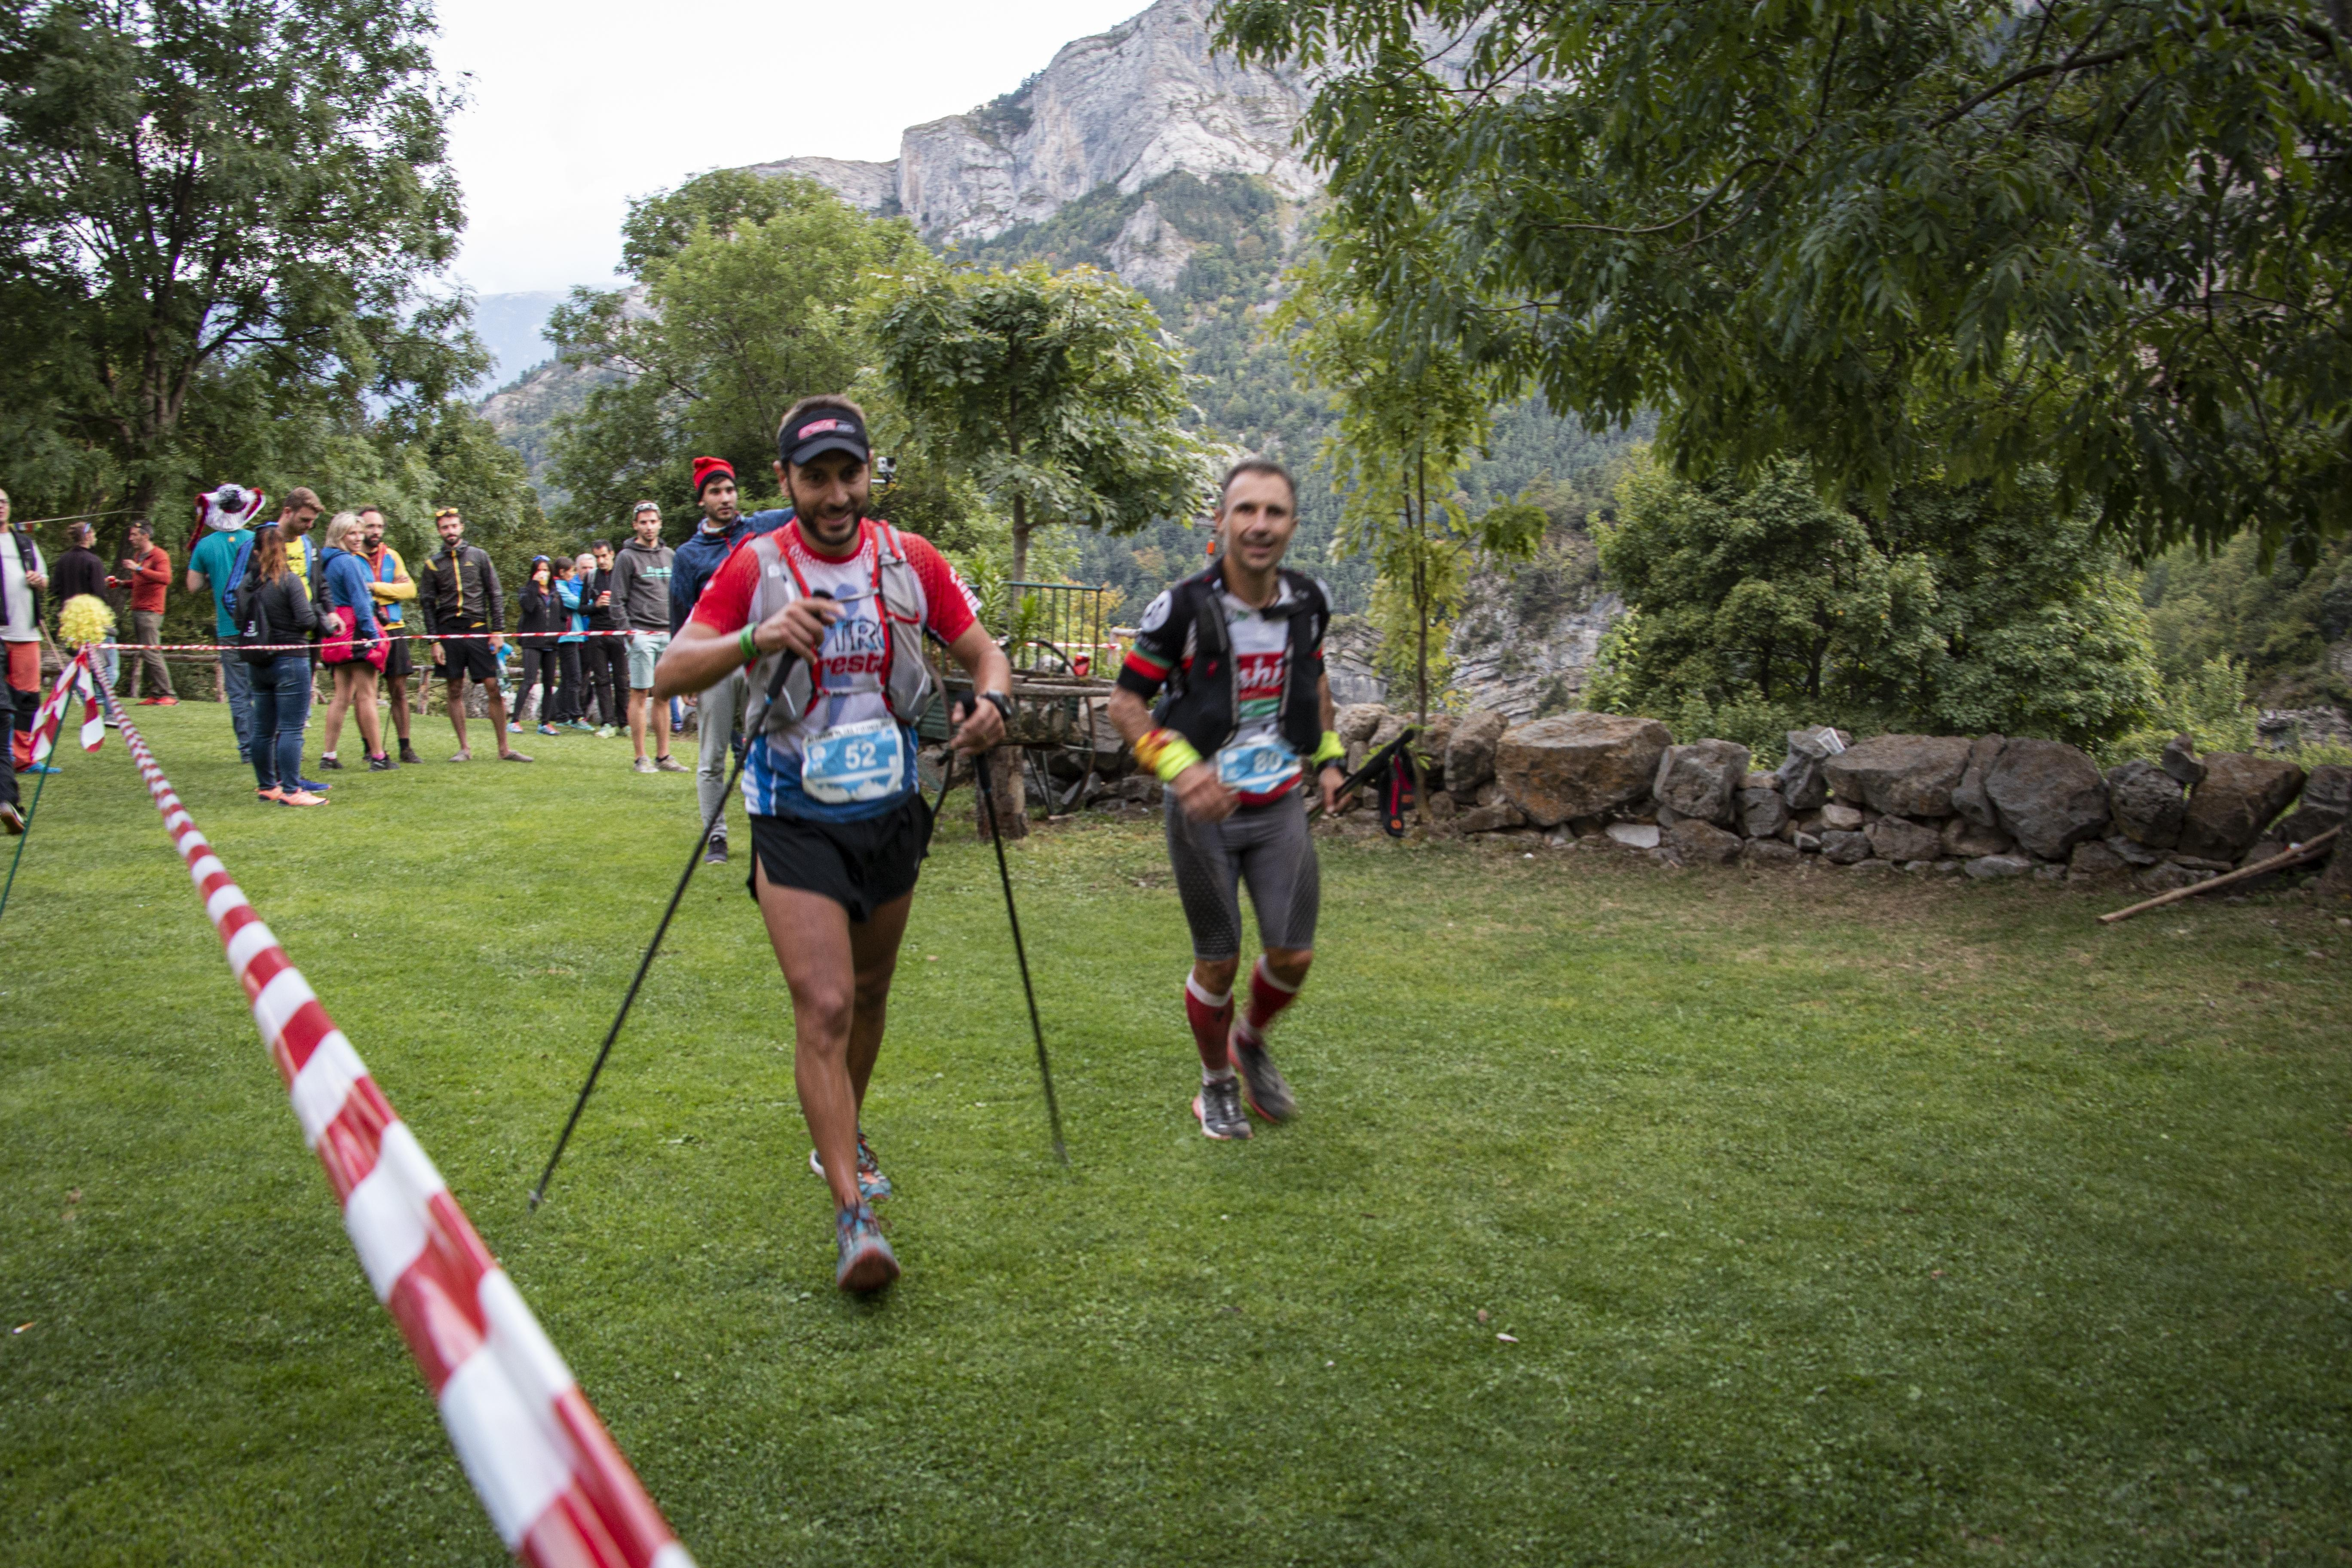 Corredors de l'Ultra Pirineu al seu pas pel Refugi de Gresolet. FOTO: Anna E. Puig